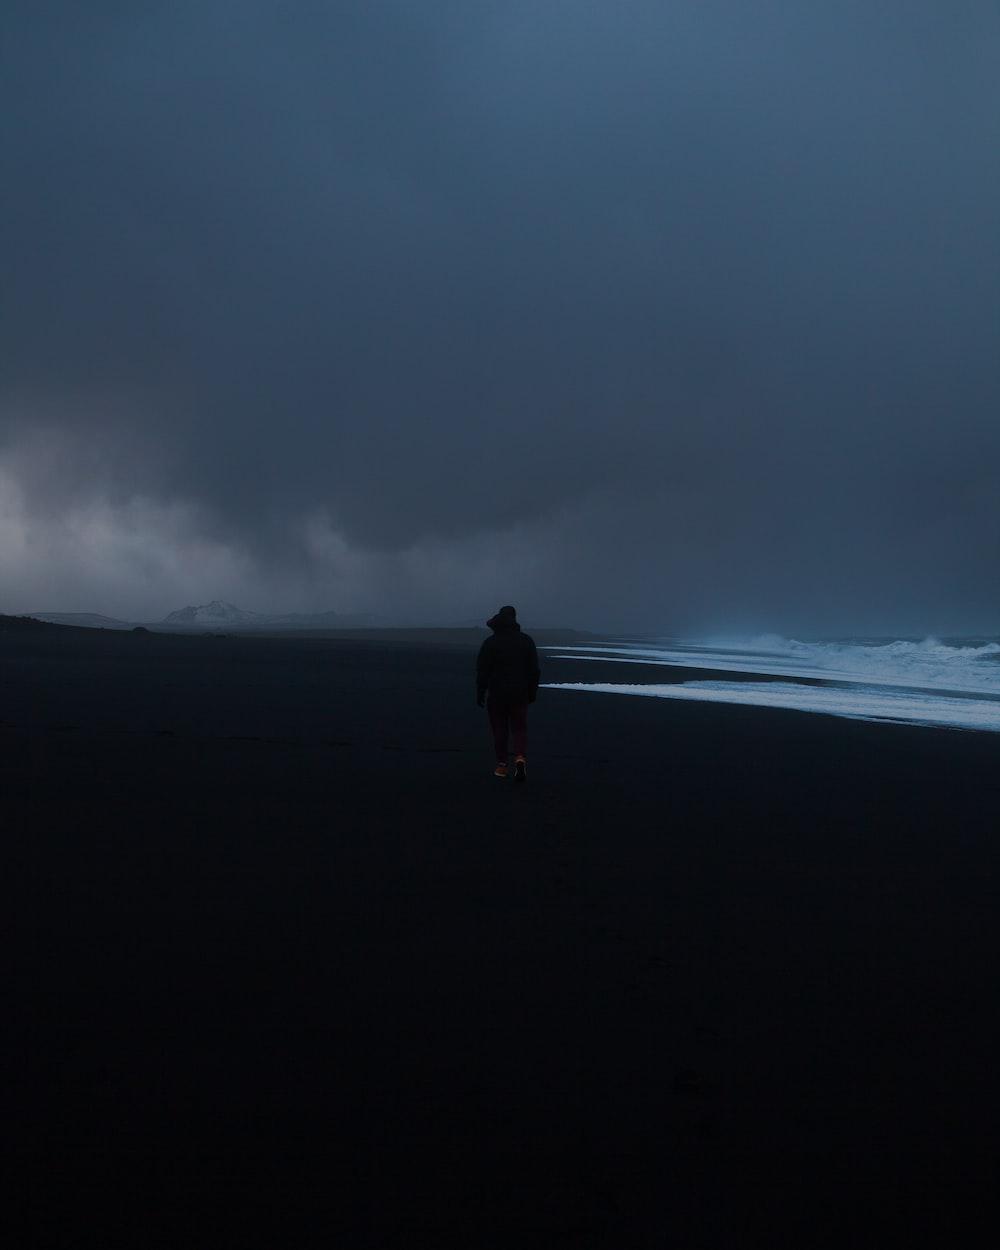 man in black jacket walking on black sand under gray cloudy sky